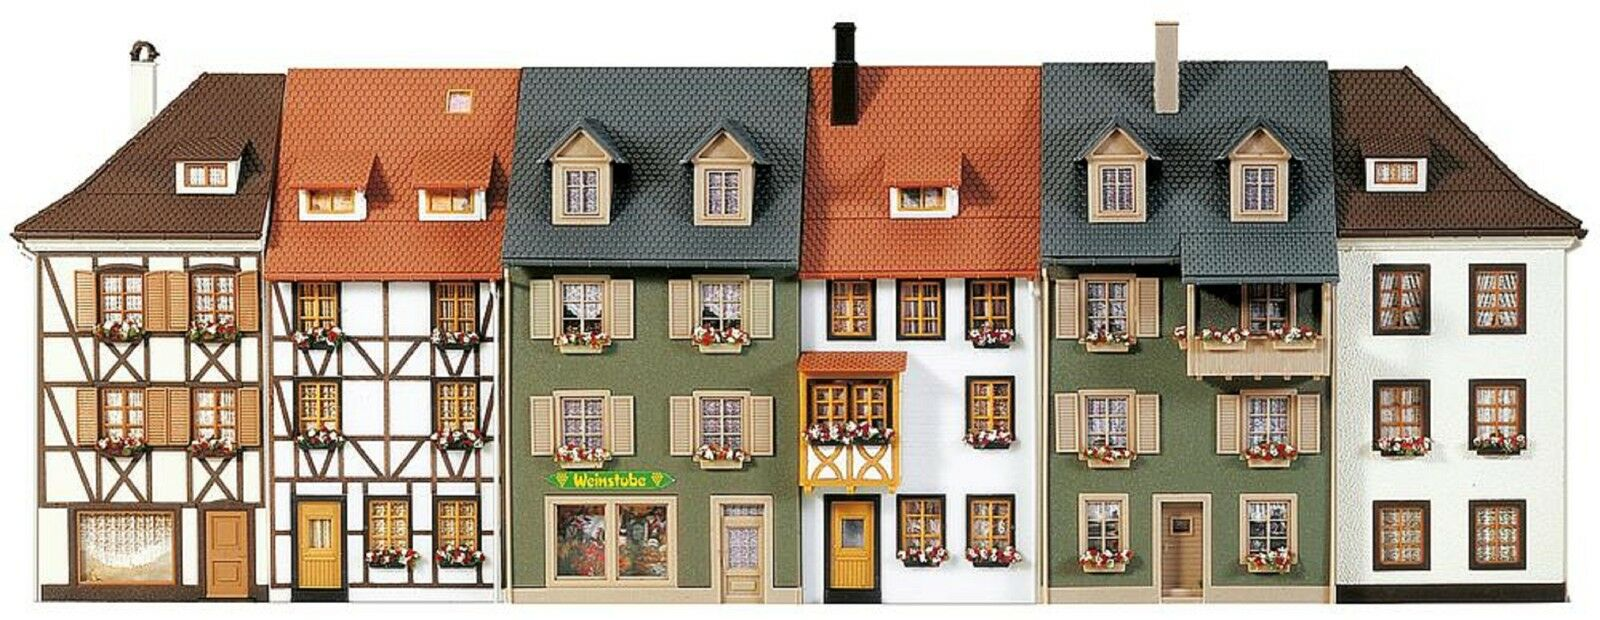 Faller 130430 h0, 6 casas de relieve, 406 mm lg, casas fila, Kit, nuevo